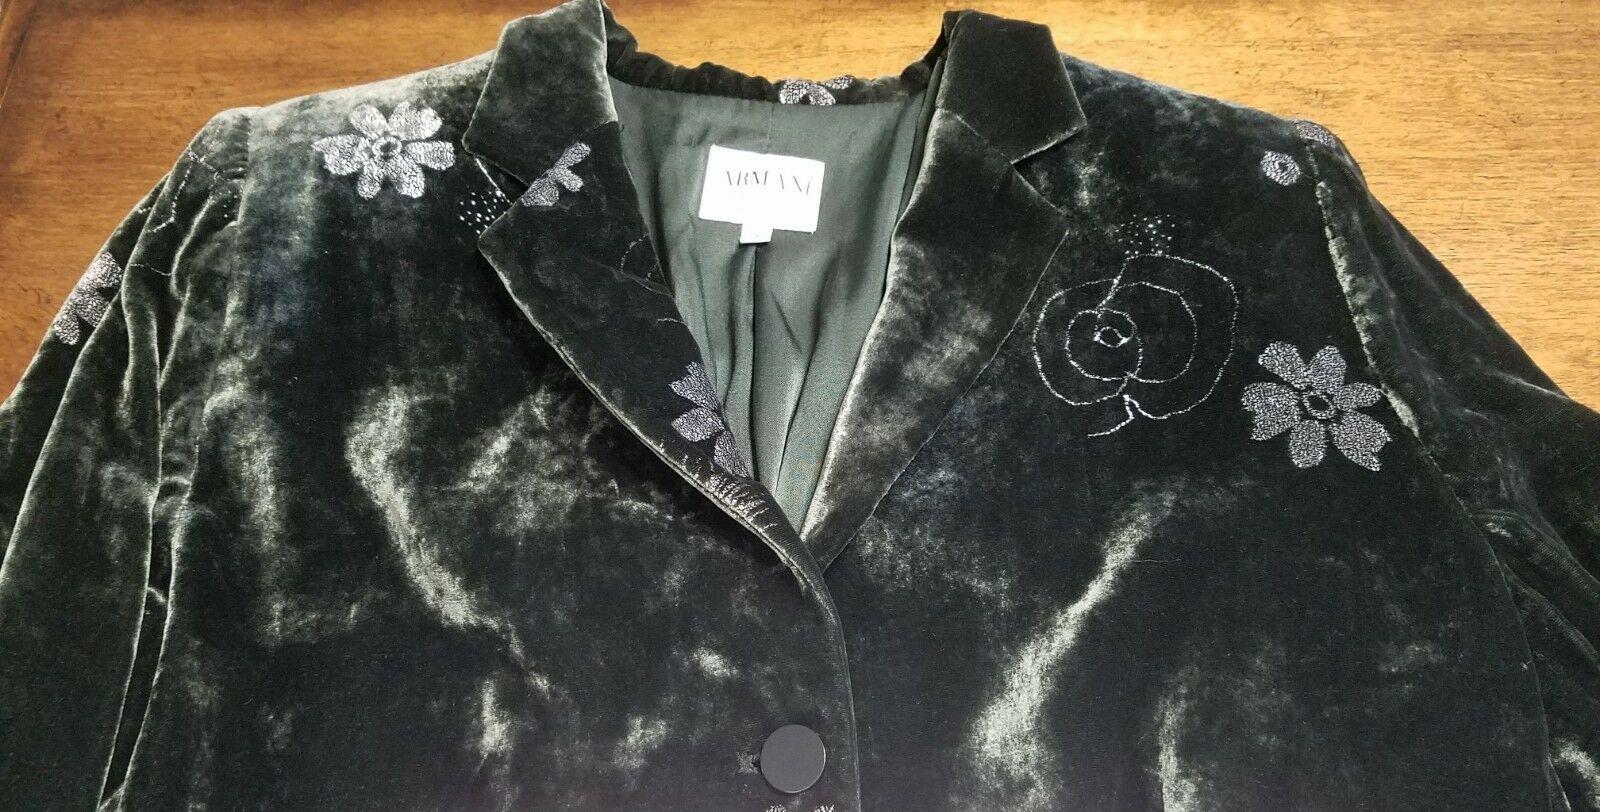 GIORGIO ARMANI COLLEZIONI 12 green floral crushed velvet fitted blazer jacket